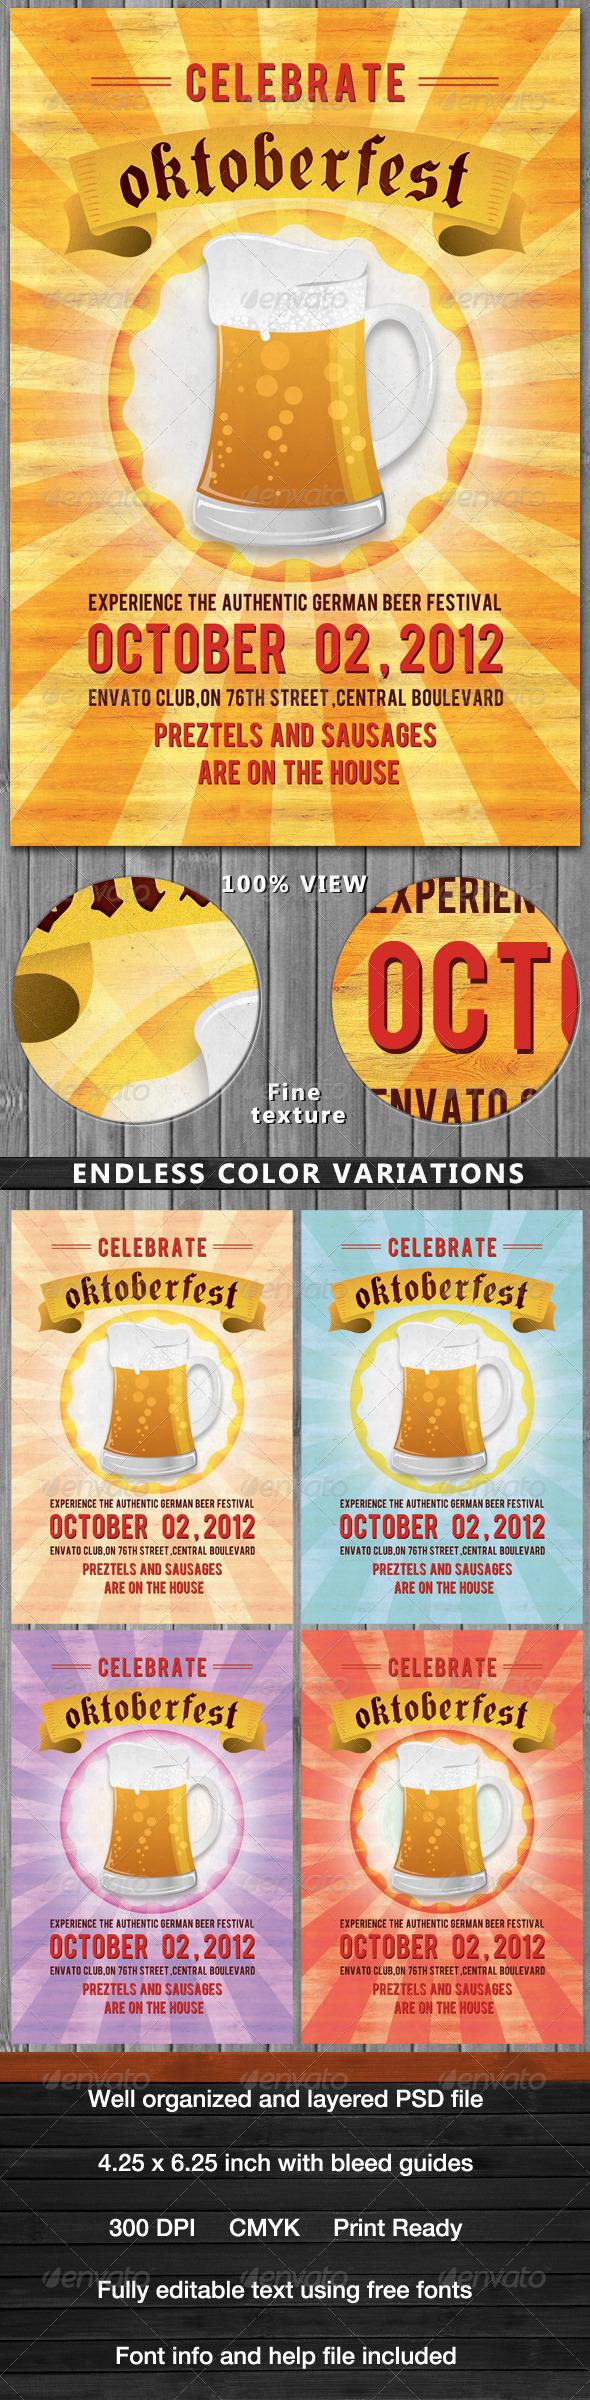 GraphicRiver Oktoberfest Flyer 2761350